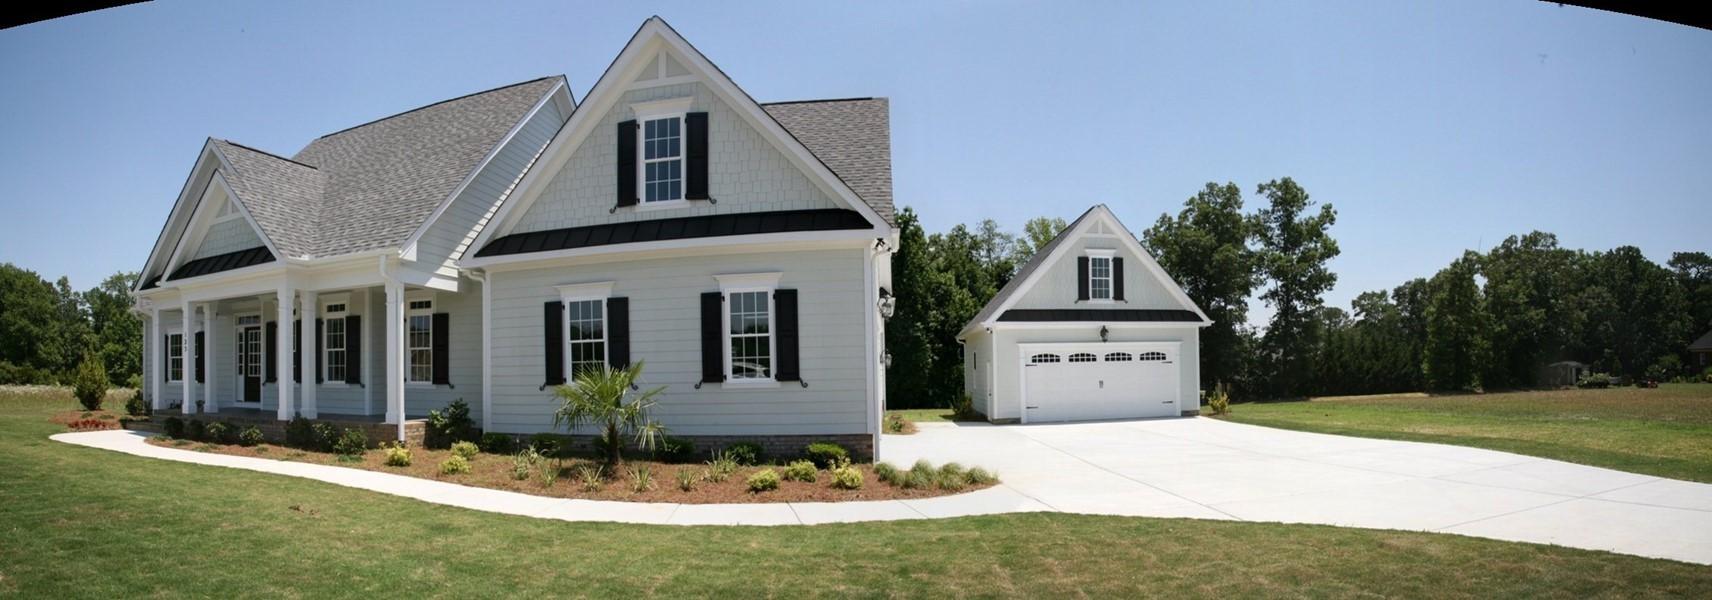 Detached garages for Homes with detached garage